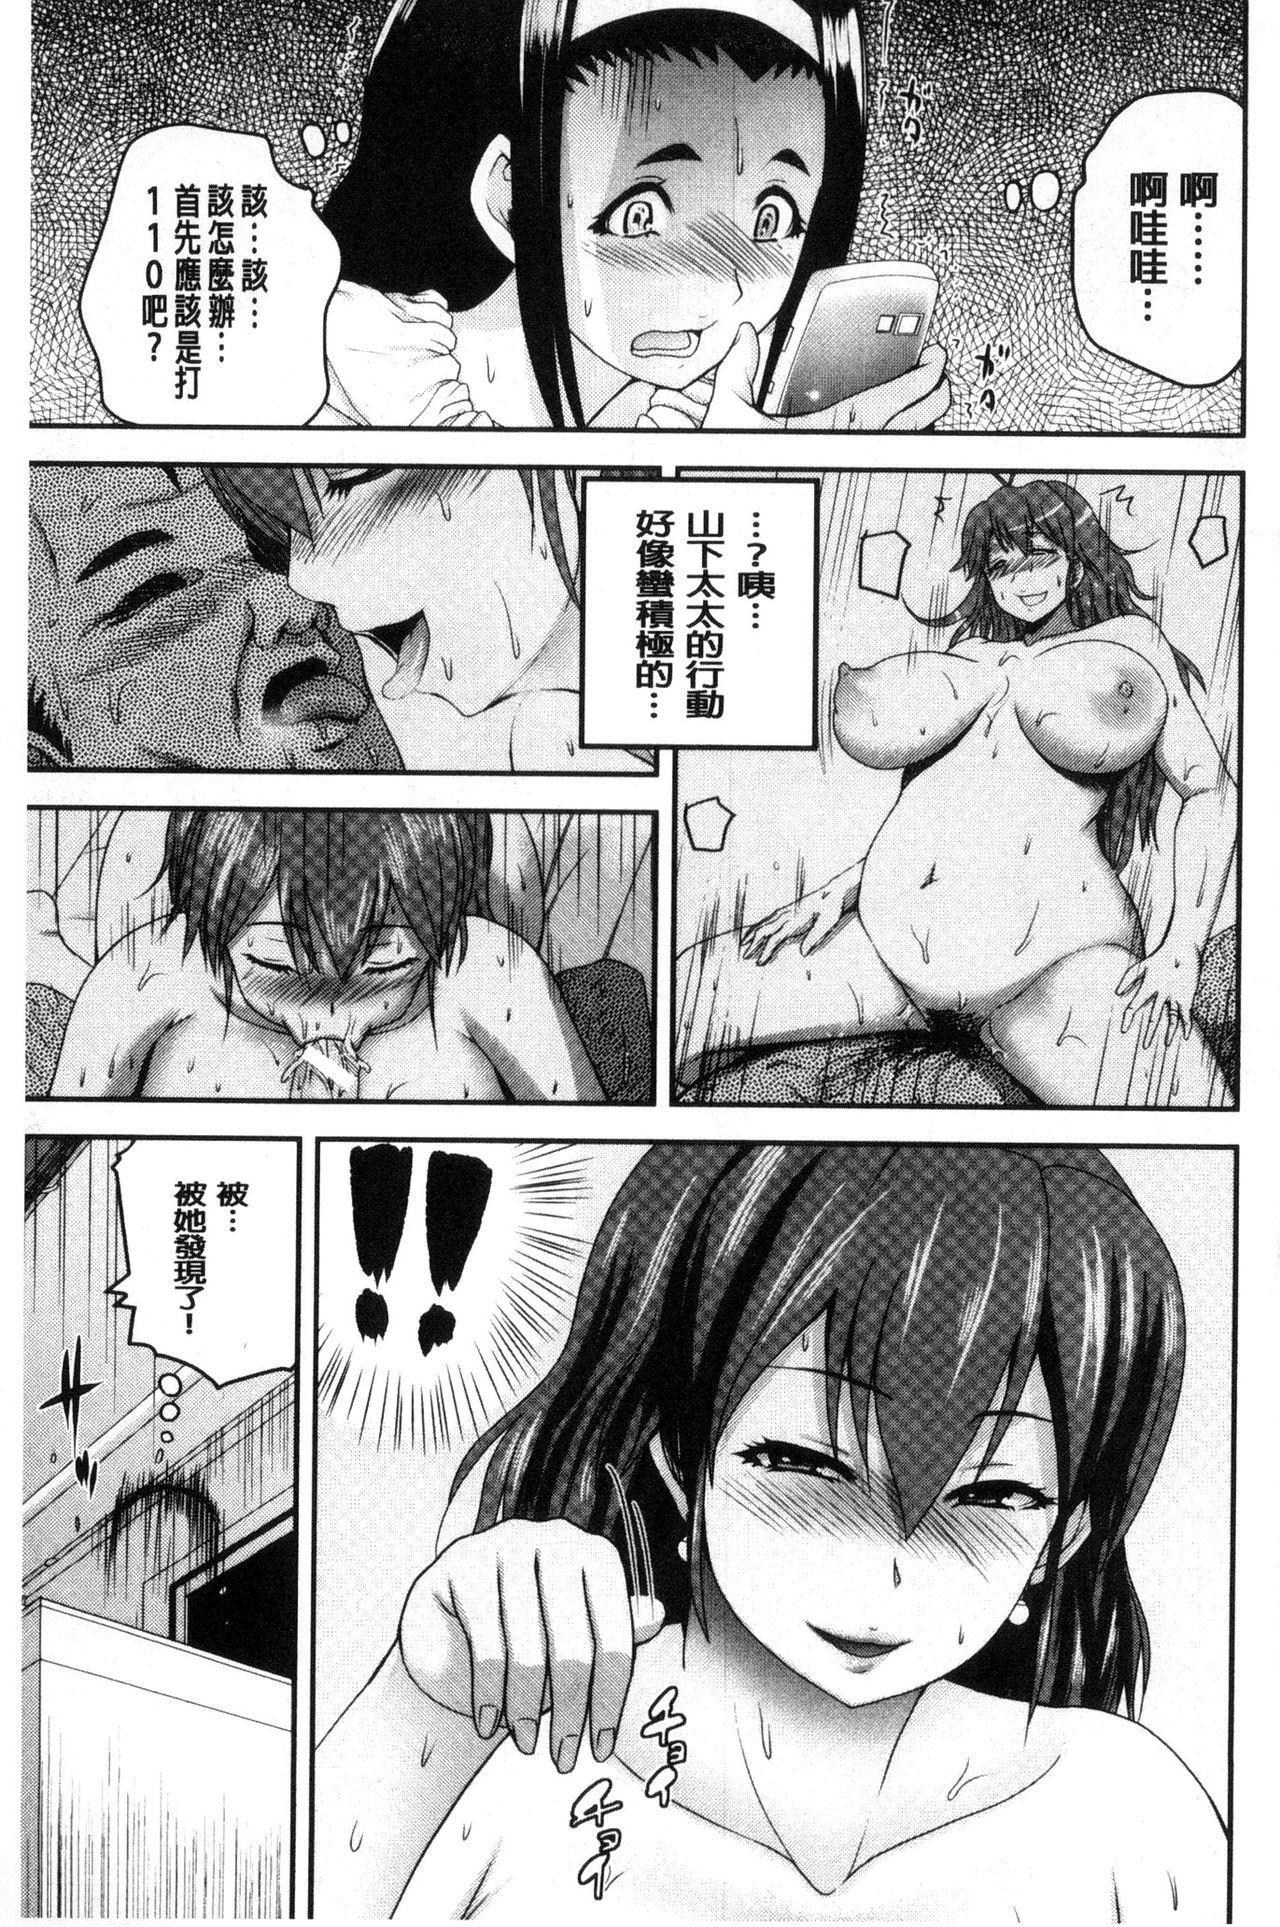 Opink Health Seibo no Fukuin 139